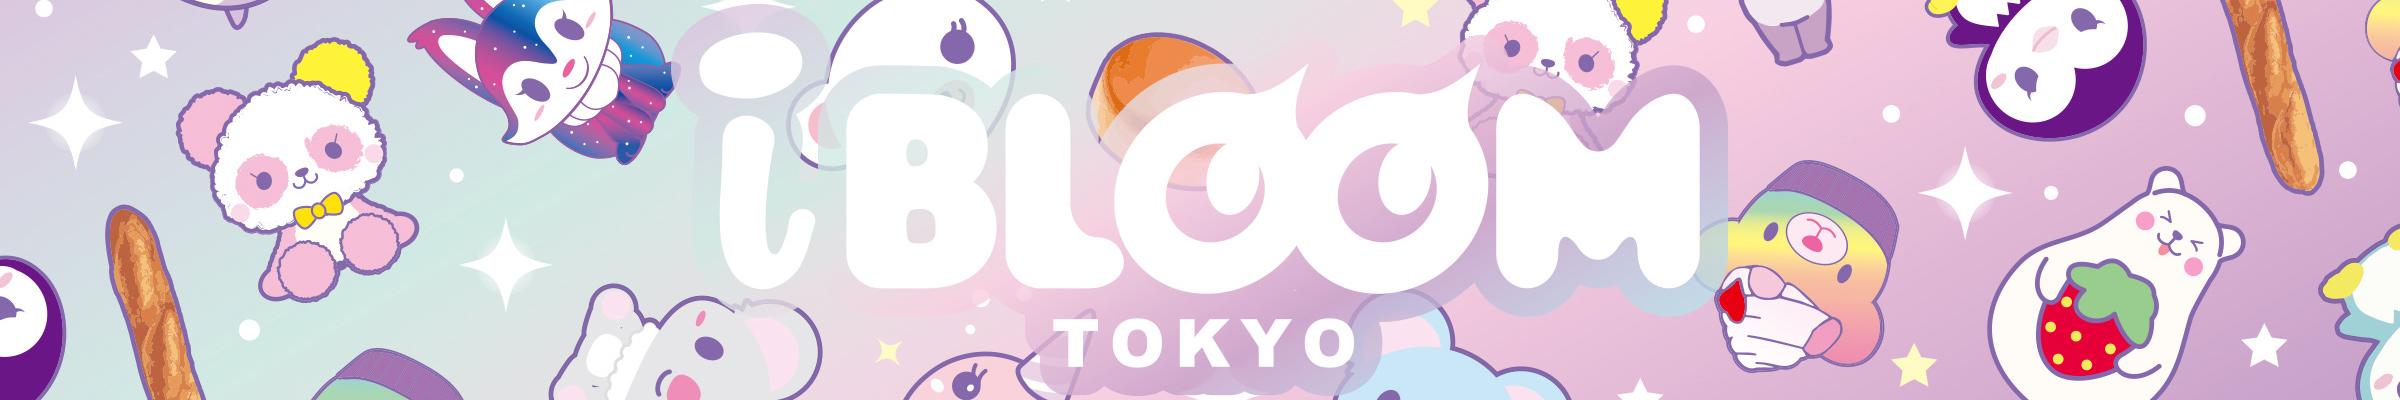 iBLOOM TOKYO